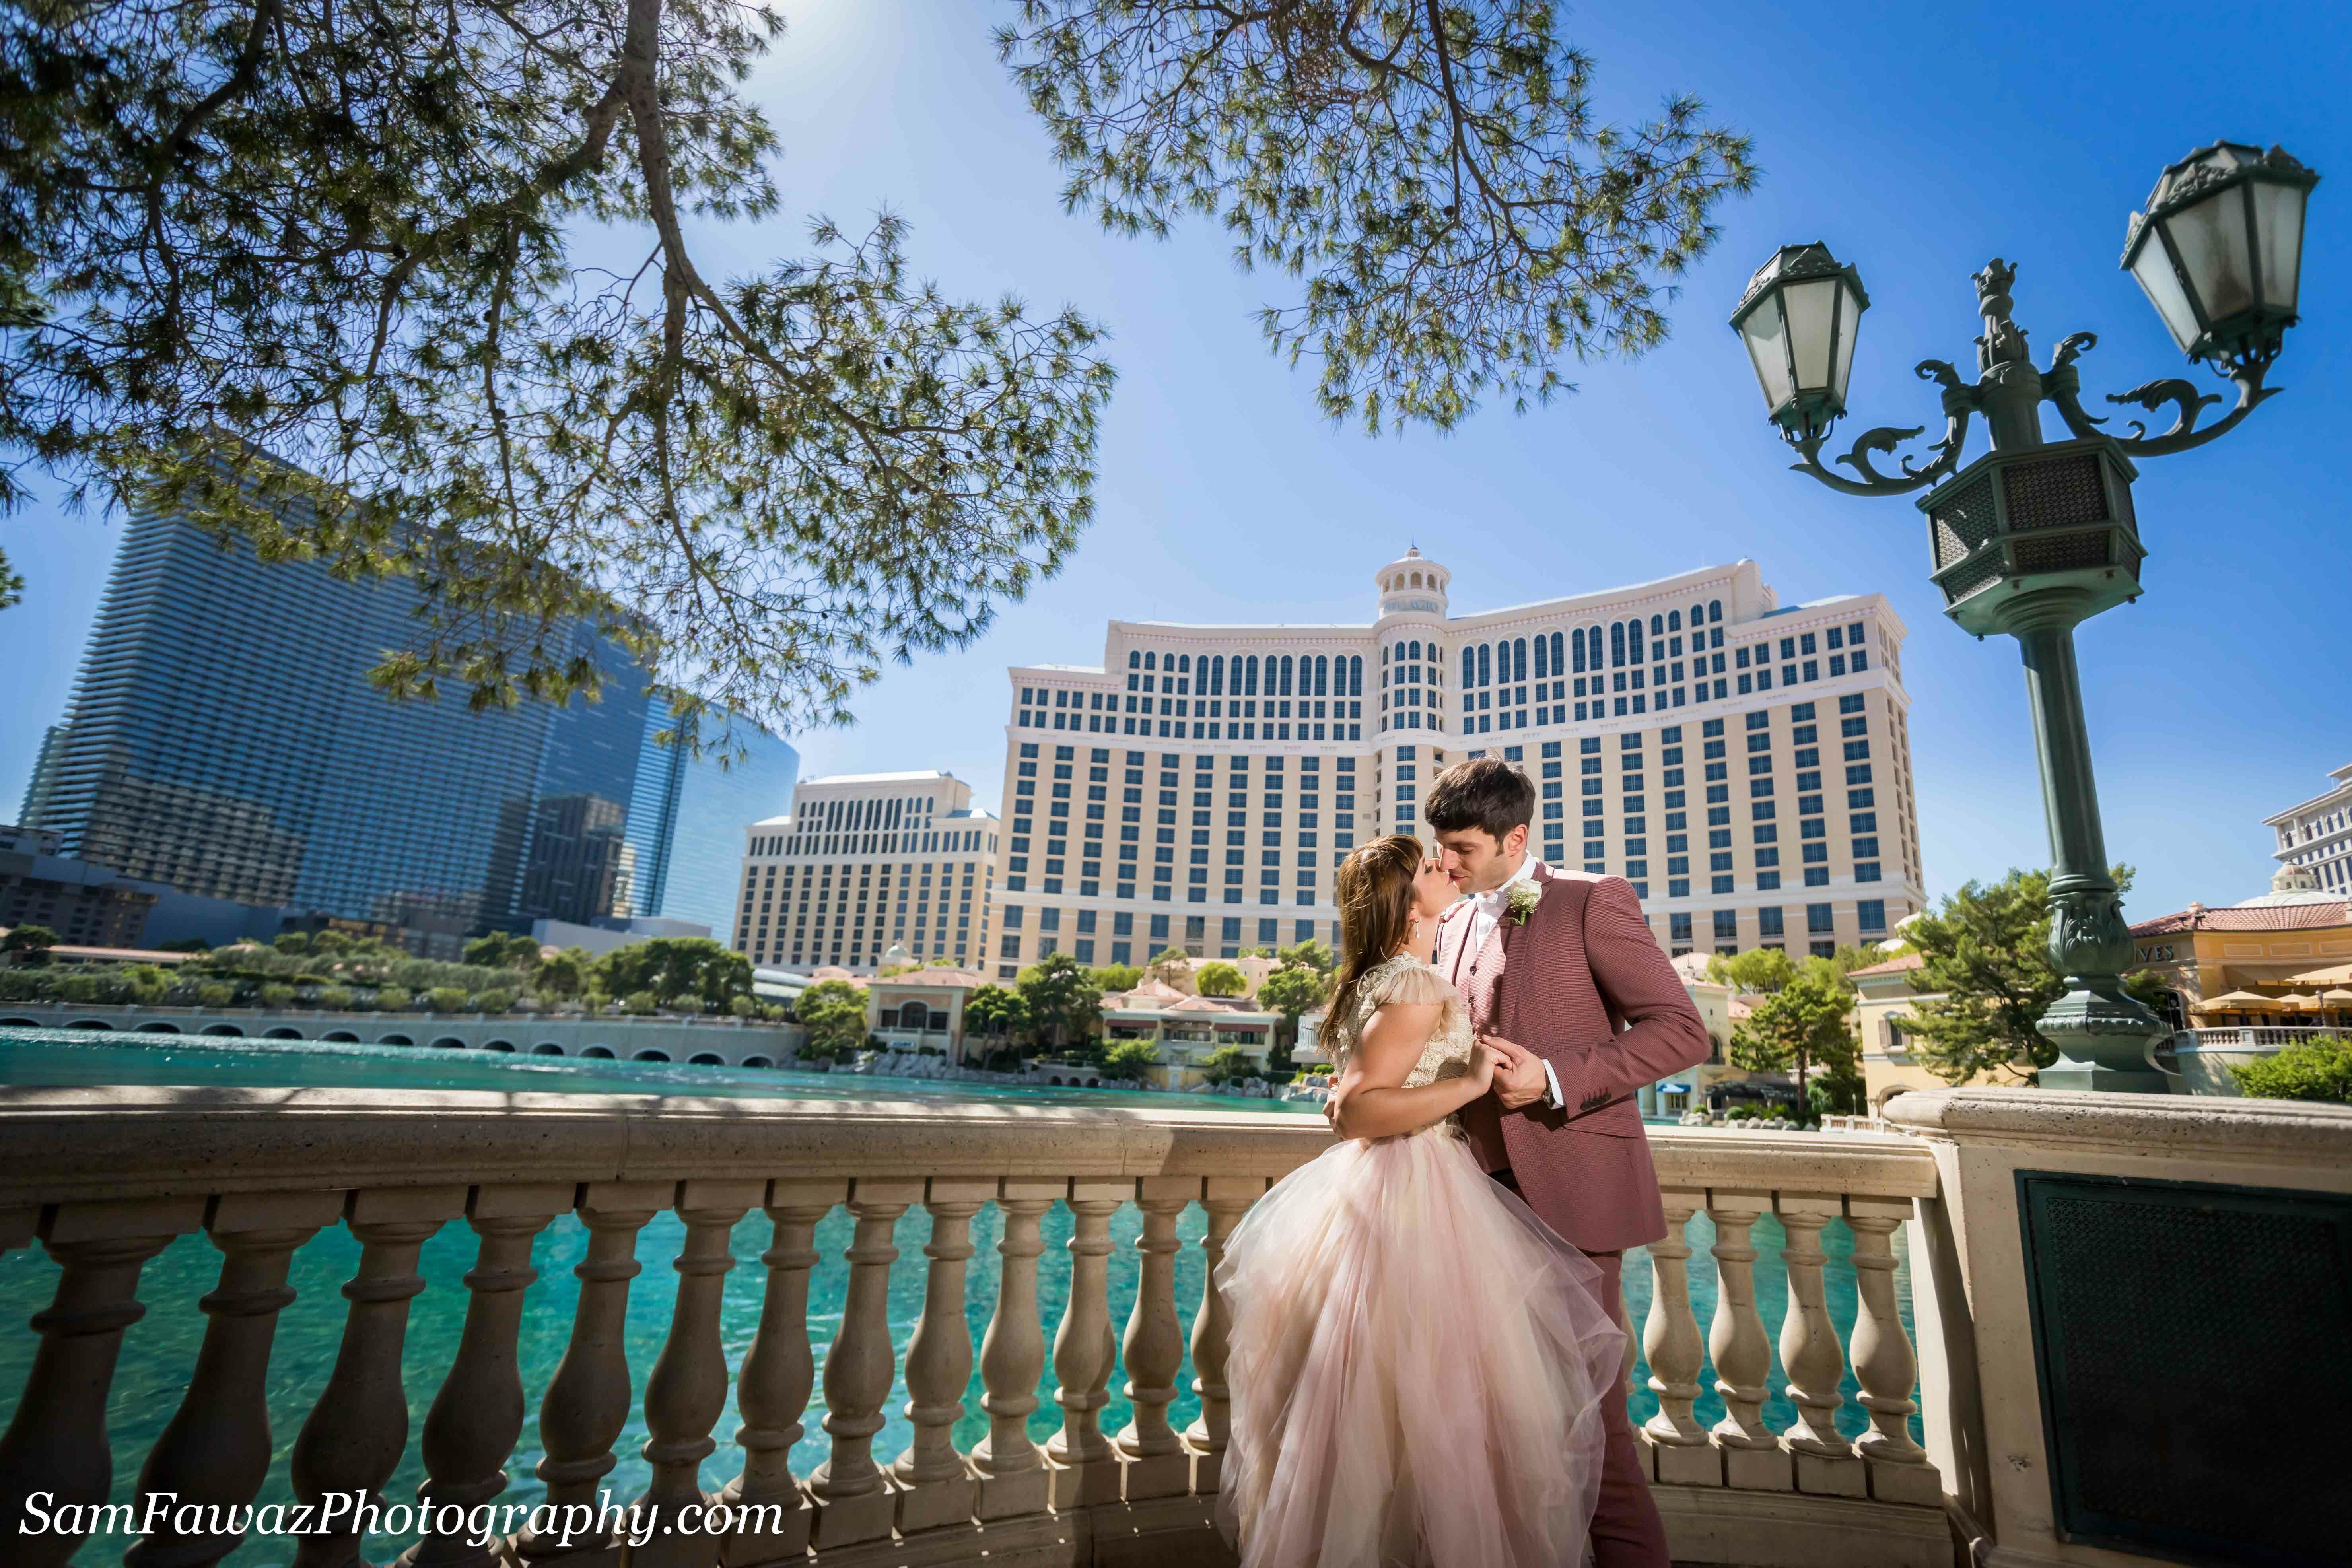 Wedding Photography Las Vegas Nevada: Sam Fawaz Photography - Las Vegas